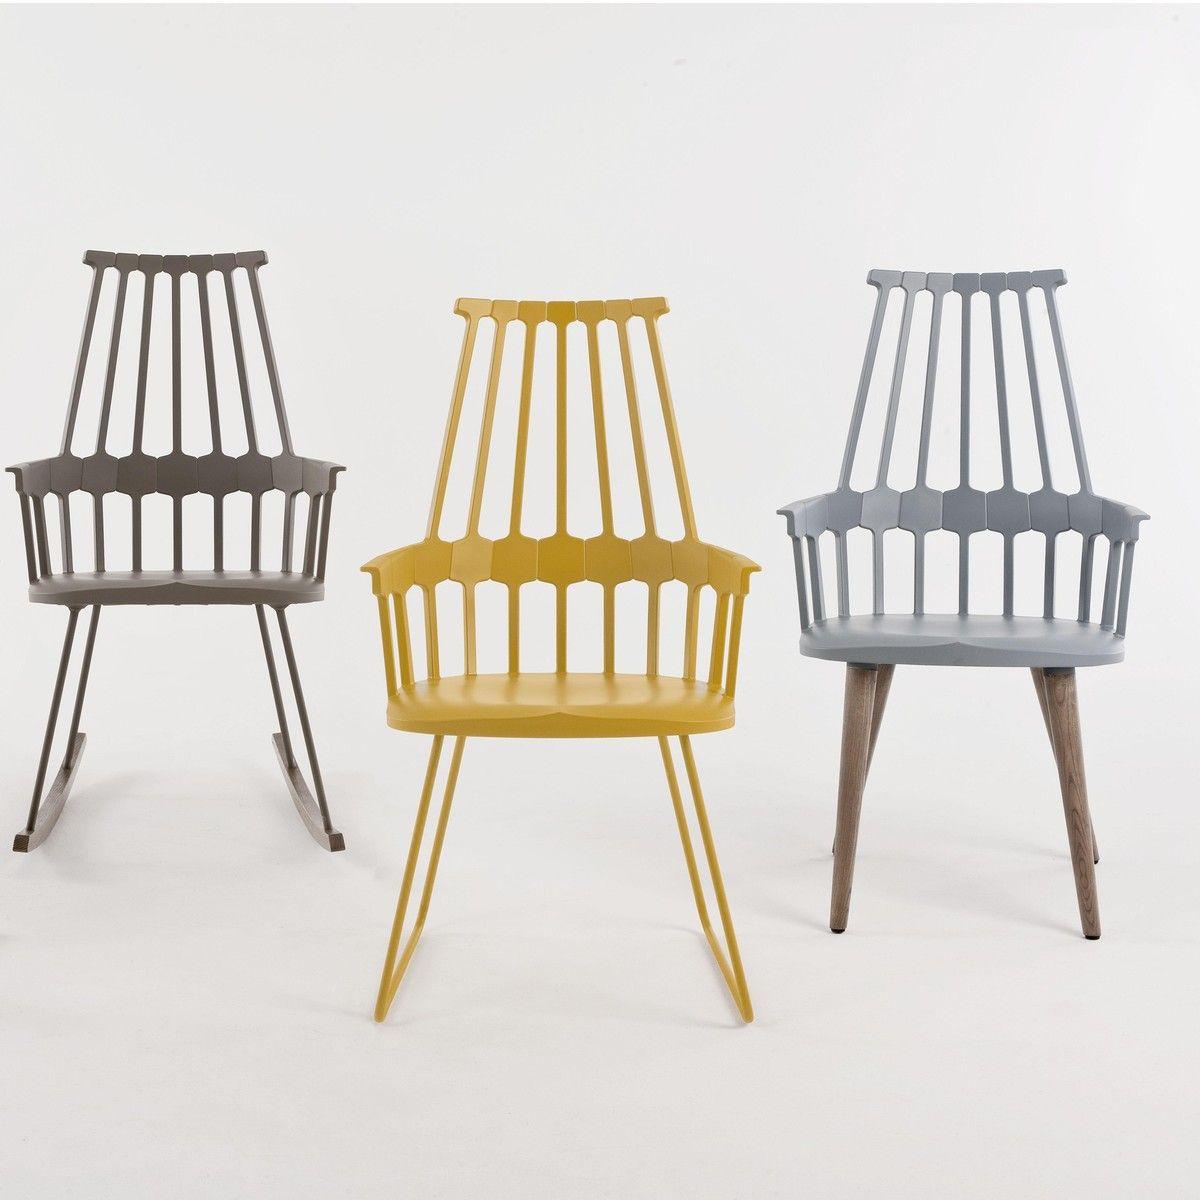 Strange Comback Rocking Chair Sit Chair Design Furniture Forskolin Free Trial Chair Design Images Forskolin Free Trialorg